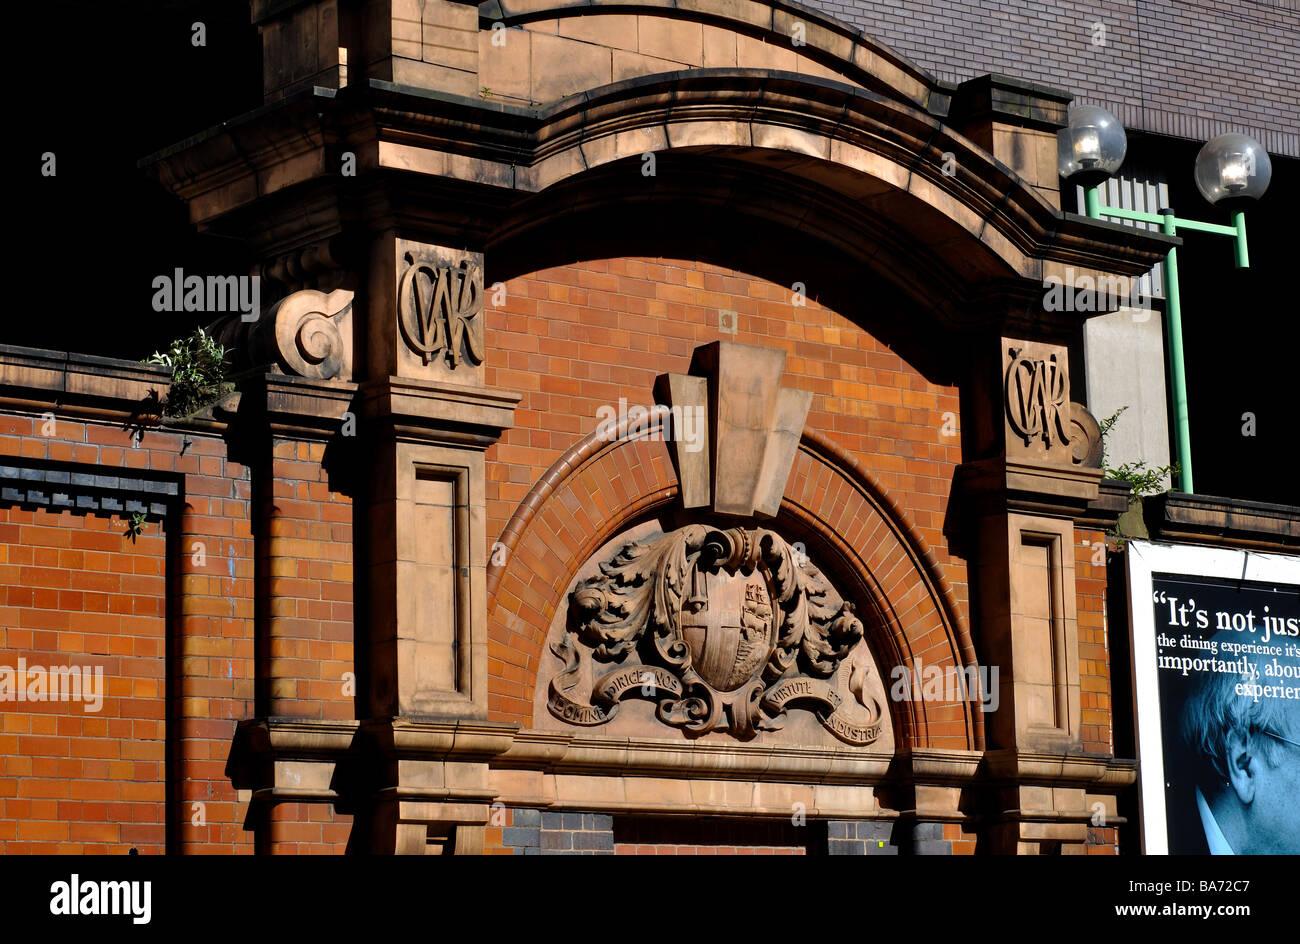 Former doorway at Snow Hill Station, Birmingham, England, UK Stock Photo